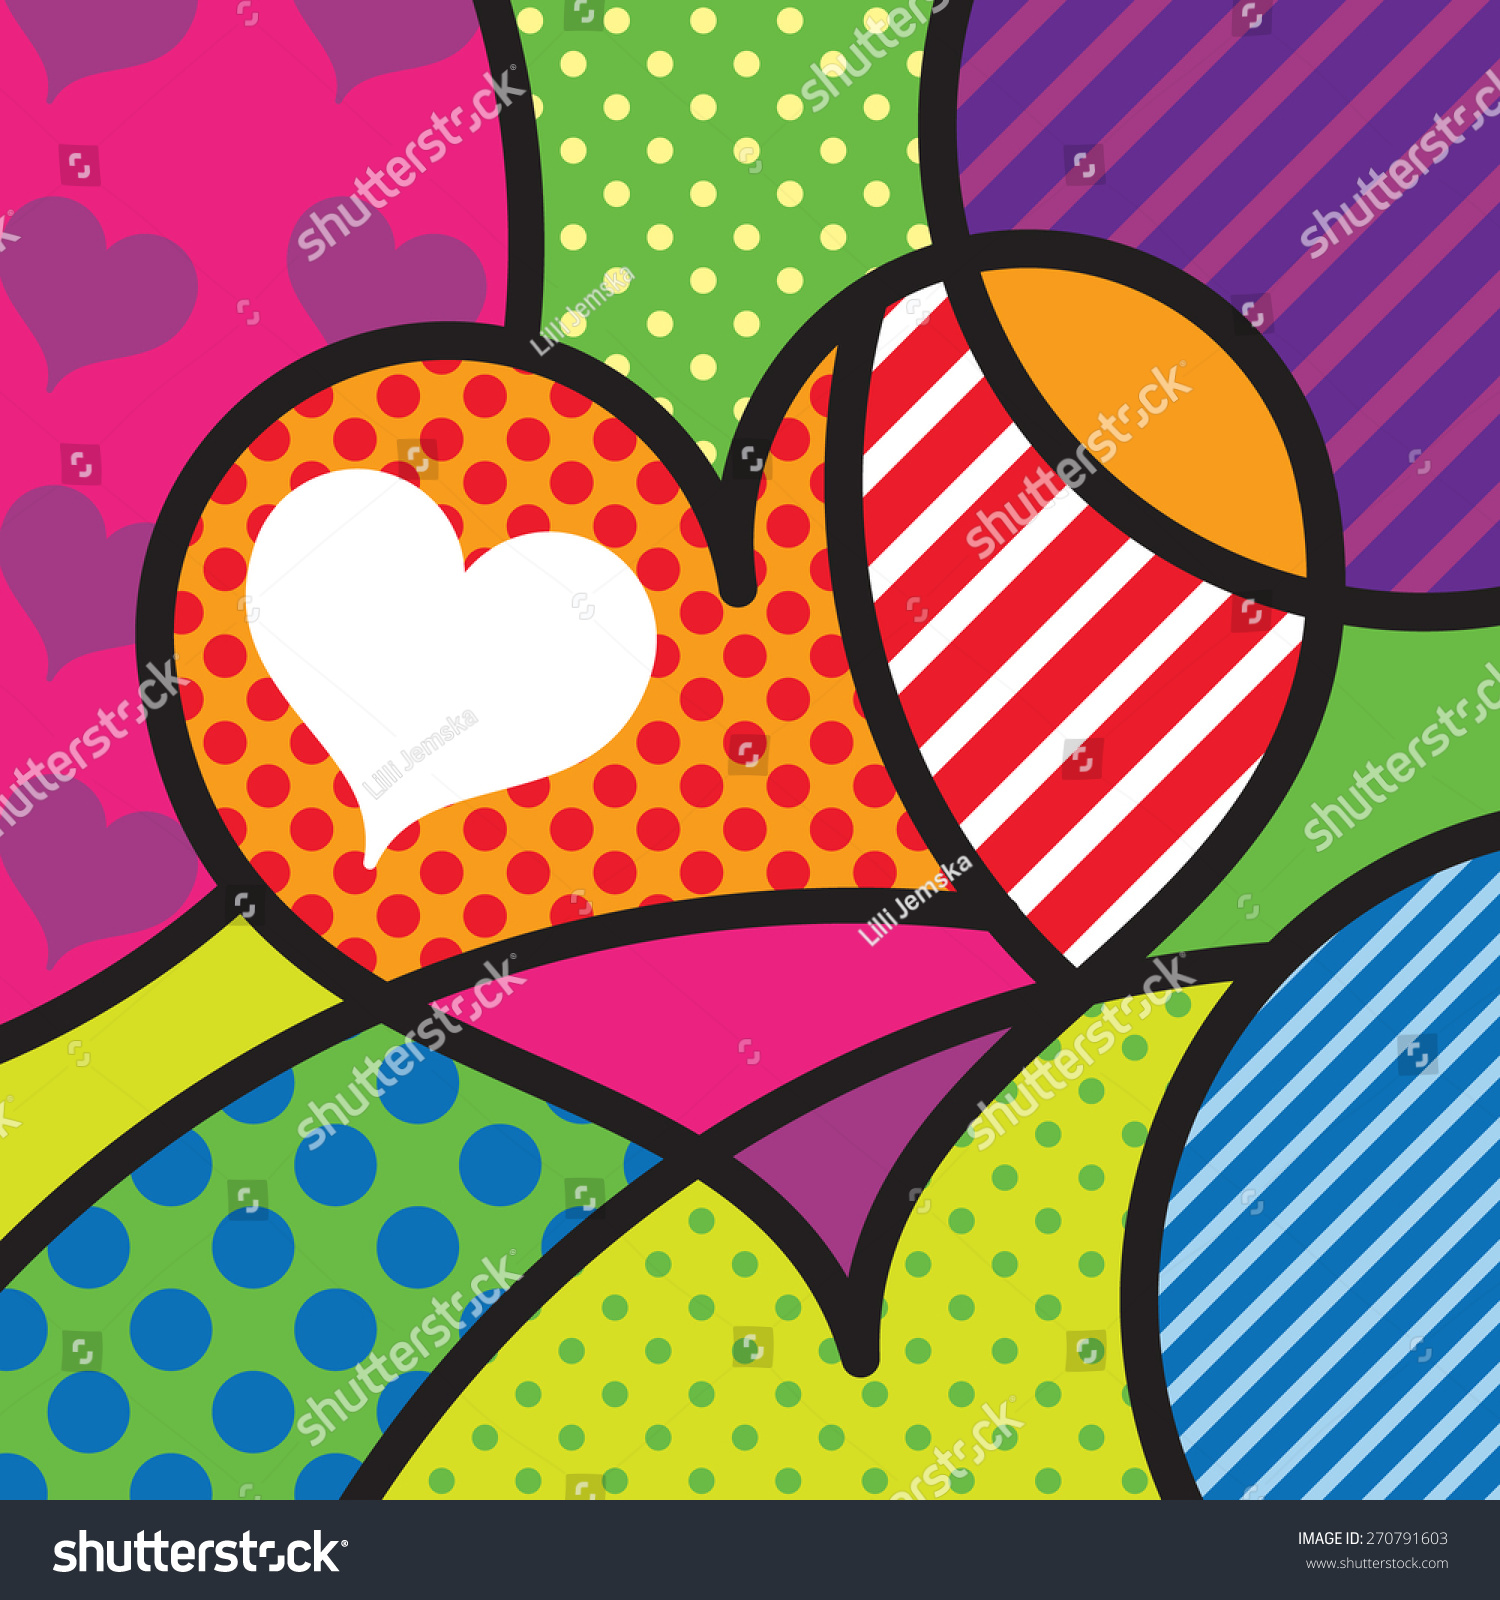 heart shape love sexy modern pop stock vector 270791603 shutterstock. Black Bedroom Furniture Sets. Home Design Ideas